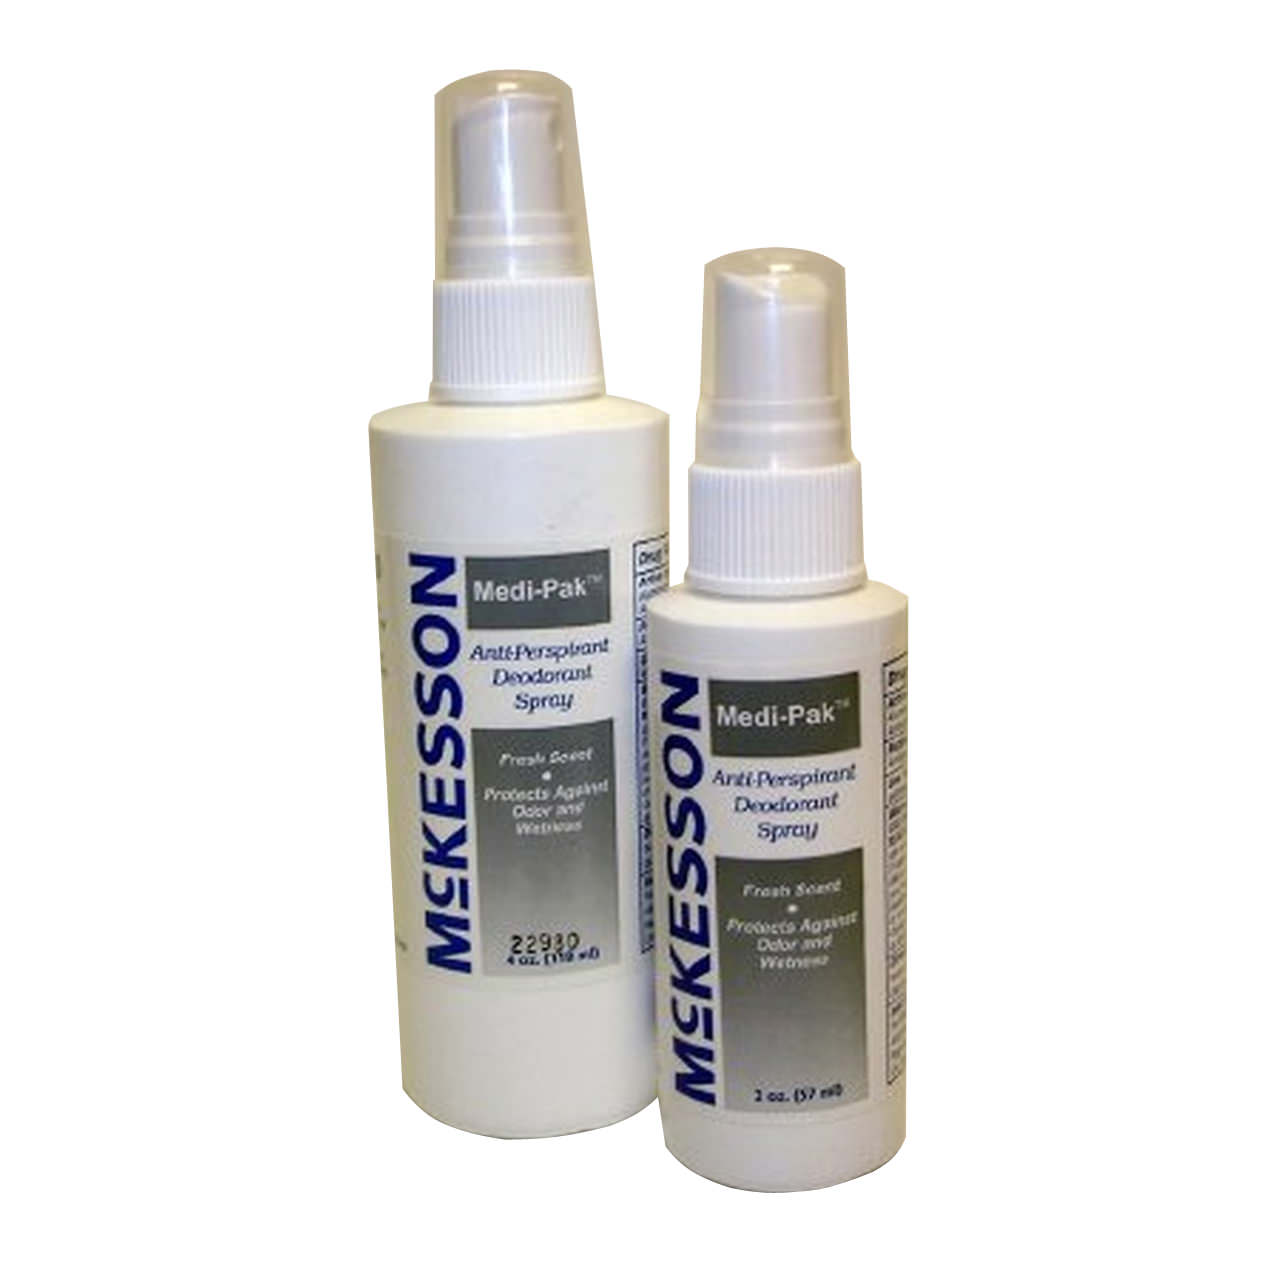 McKesson Antiperspirant / Deodorant Spray, 4 oz., Fresh Scent